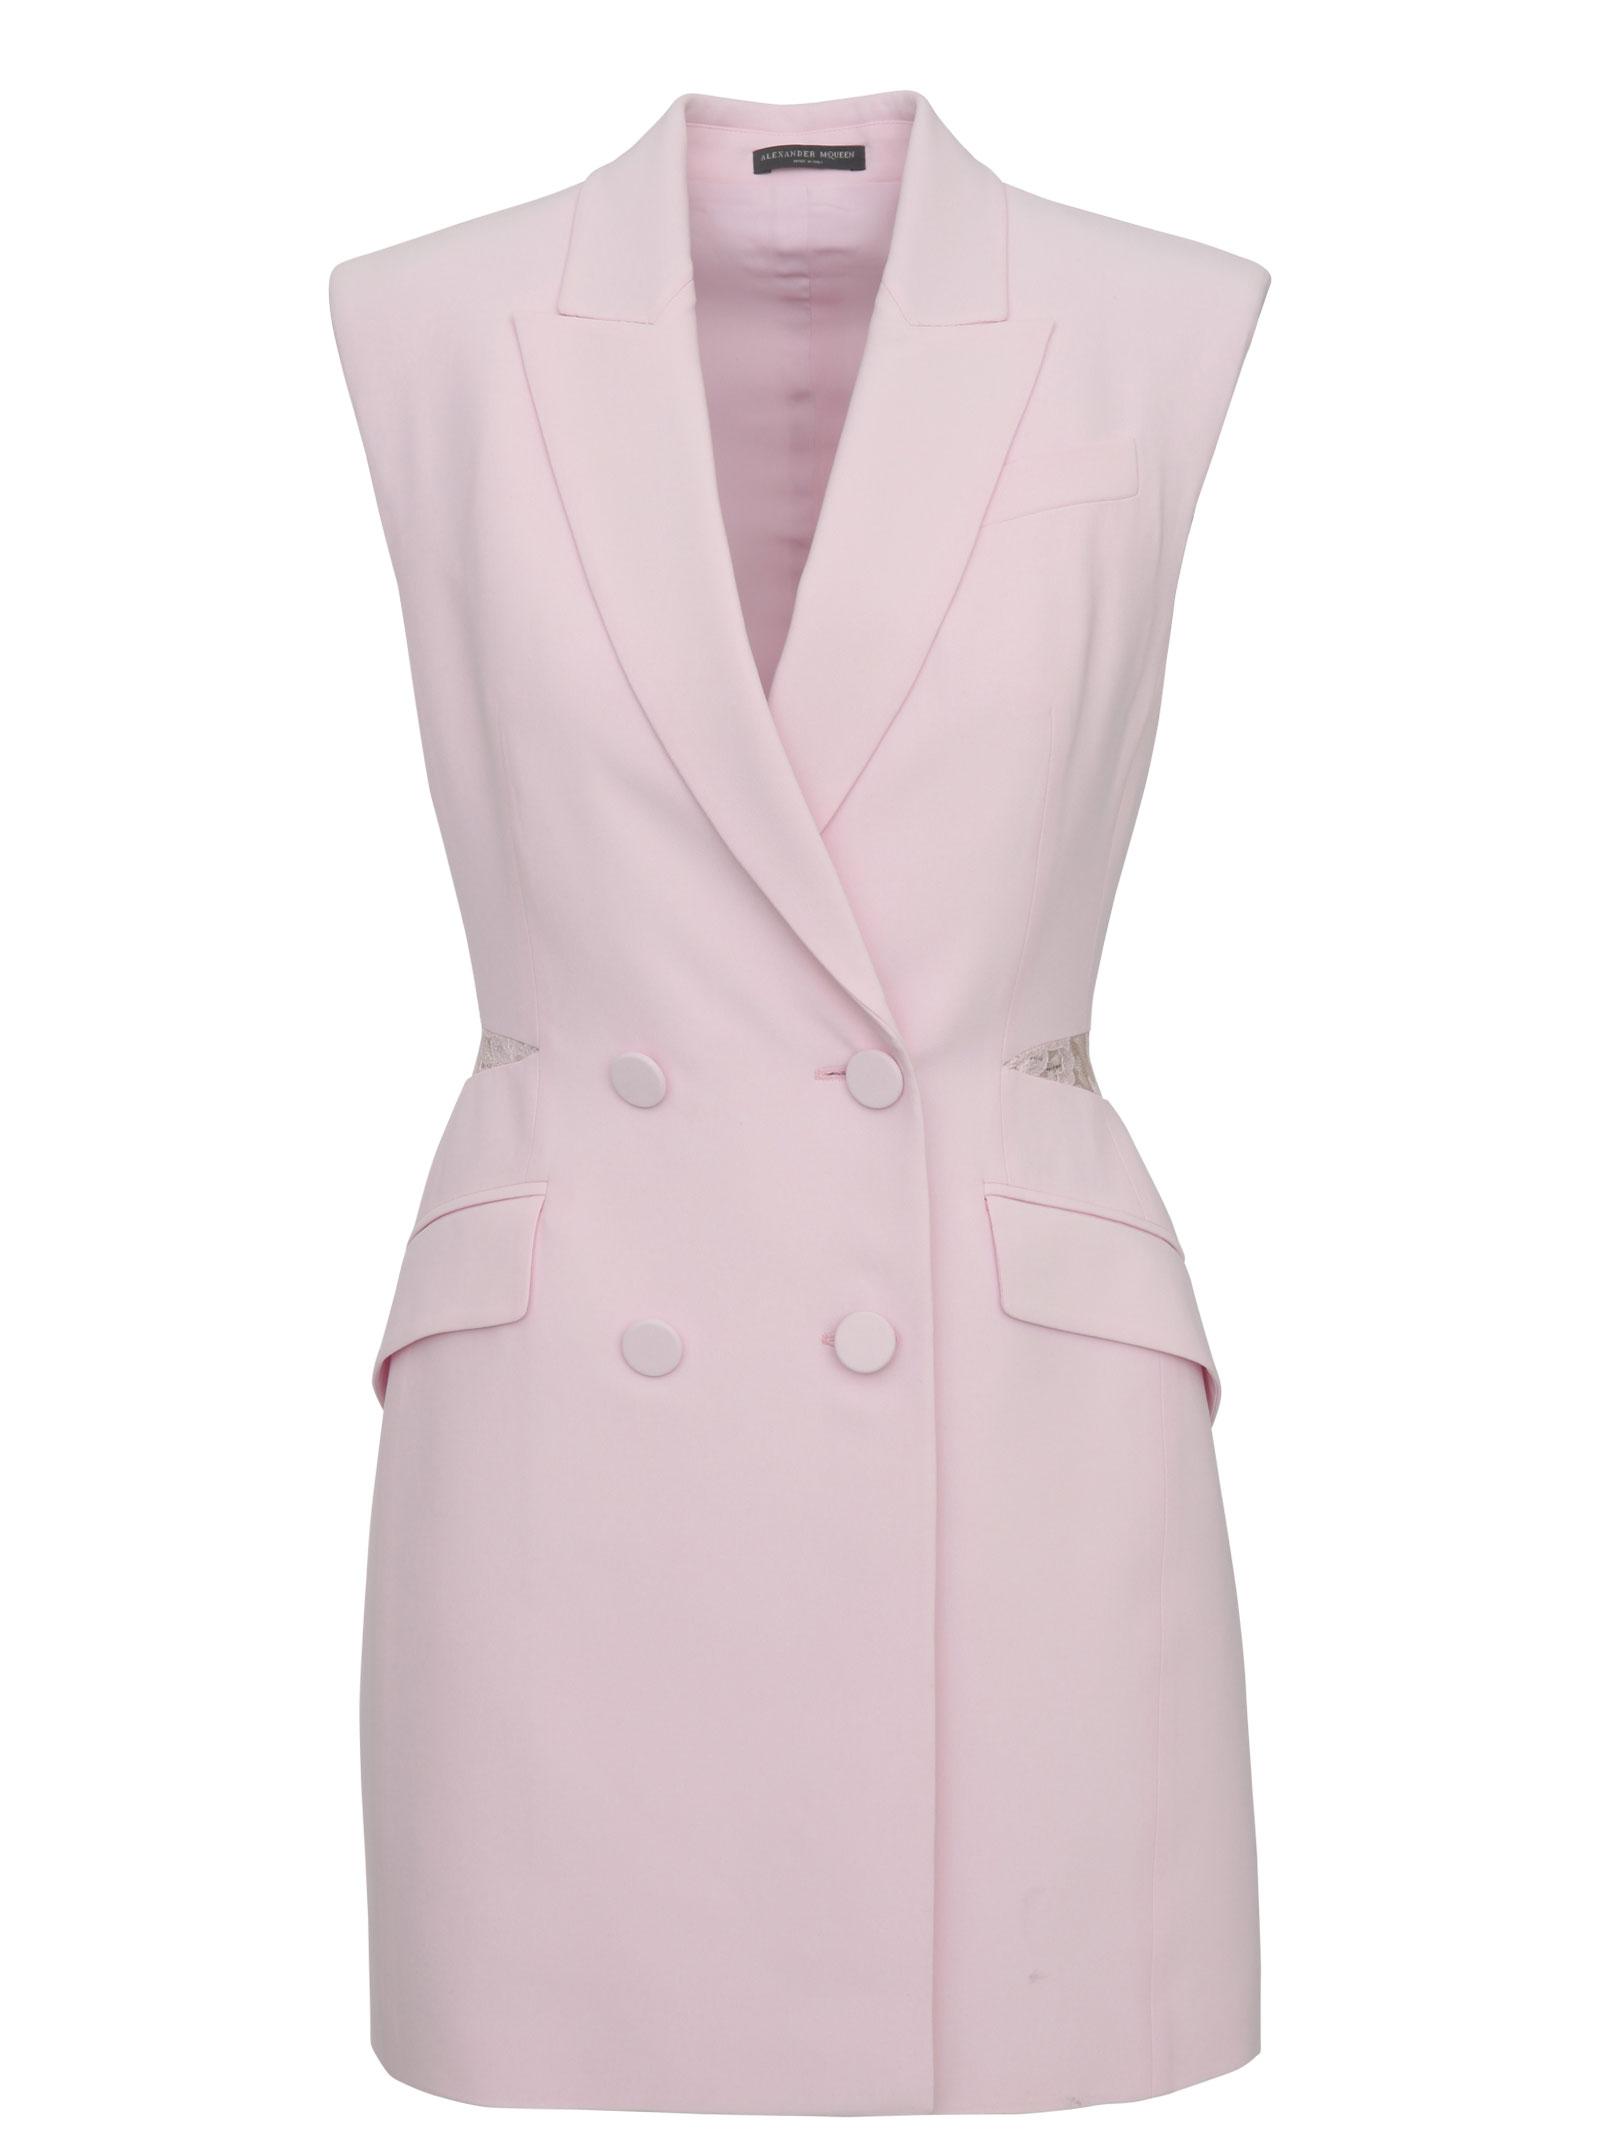 80aba01aad0 Michele Franzese Moda. 0. Alexander McQueen Dress Alexander McQueen